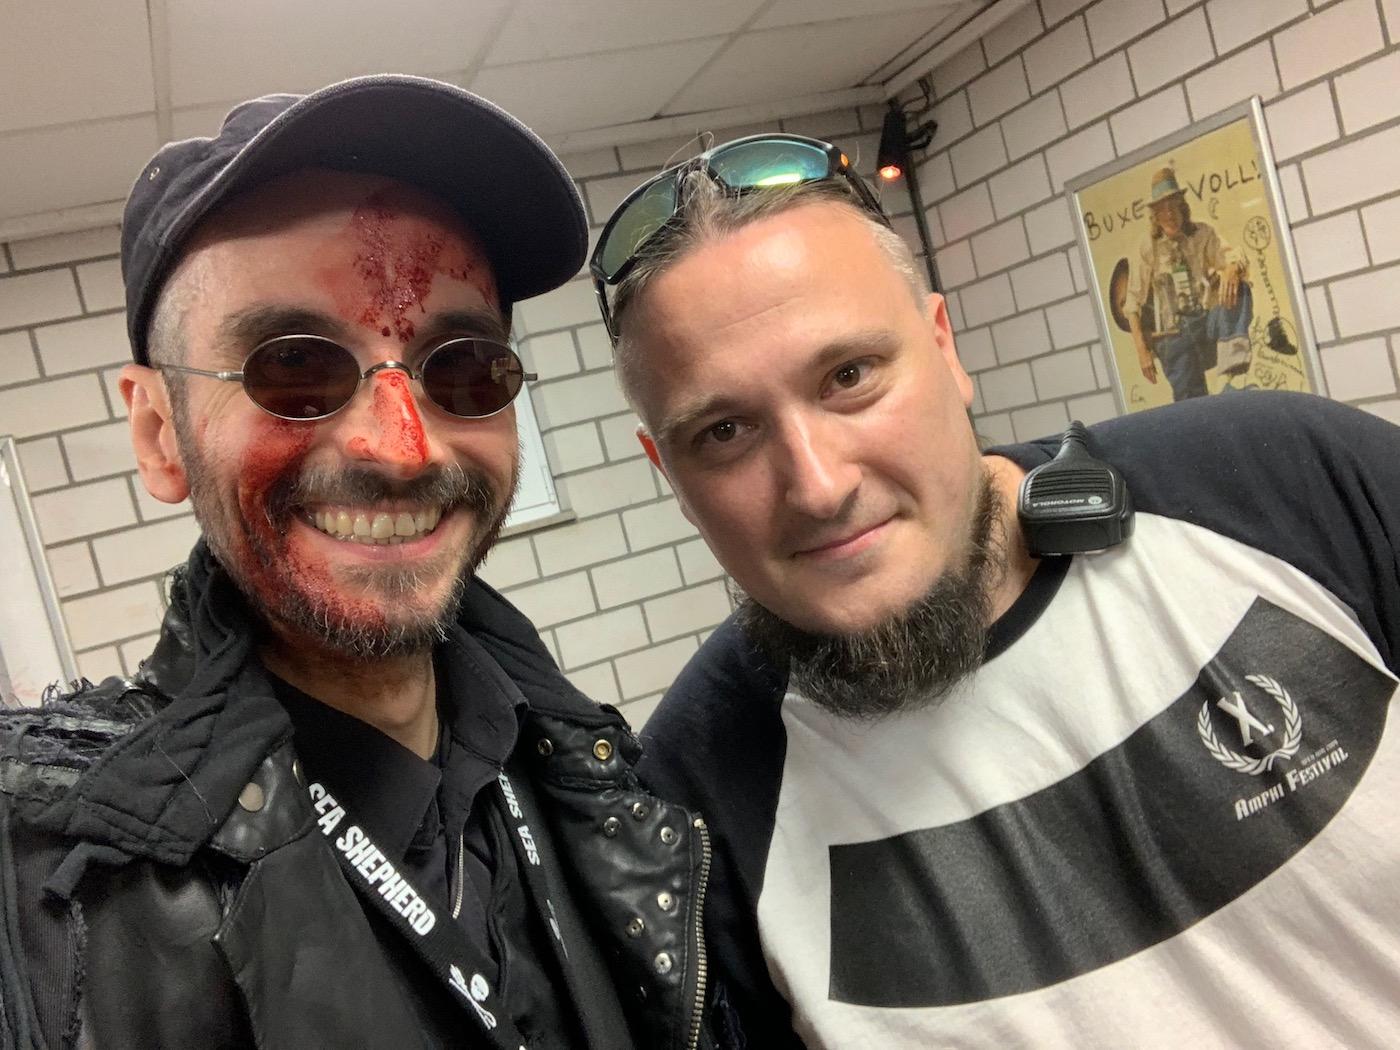 mark_benecke_amphi_festival_koeln_2019 - 210.jpg